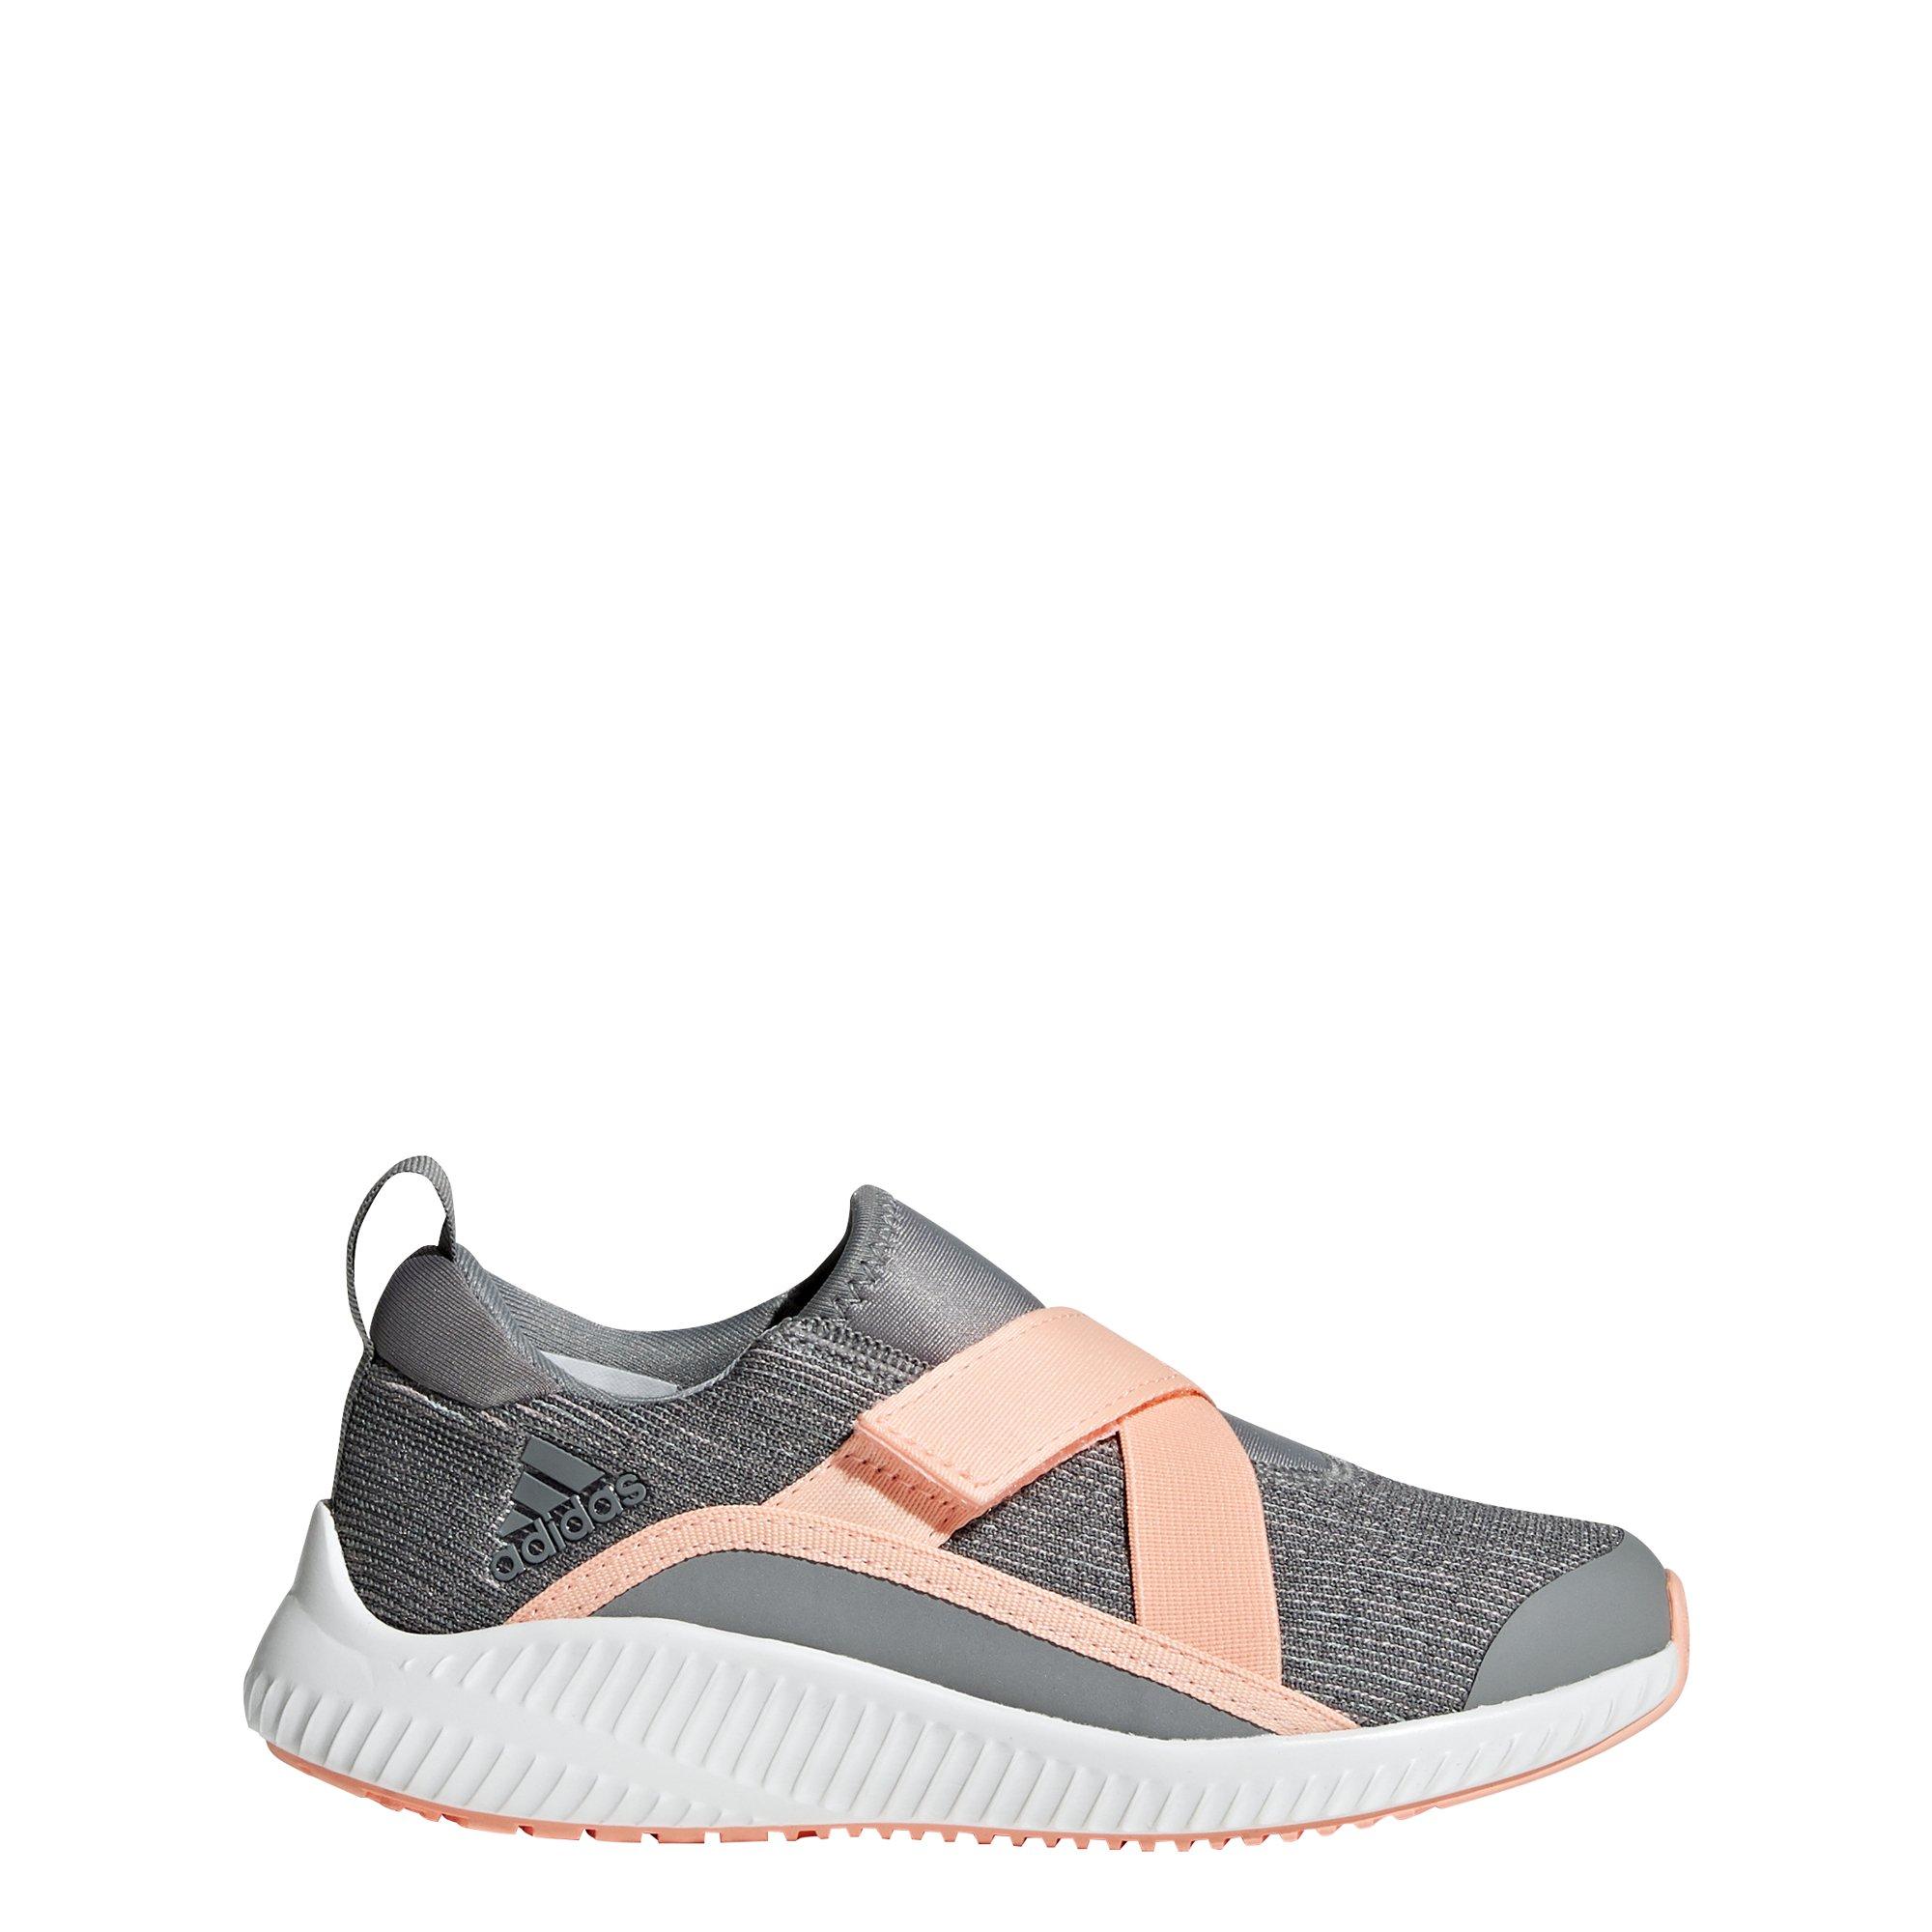 adidas Originals Unisex-Kids Fortarun Running Shoe, Grey/Clear Orange/Aero Green, 6.5 M US Big Kid